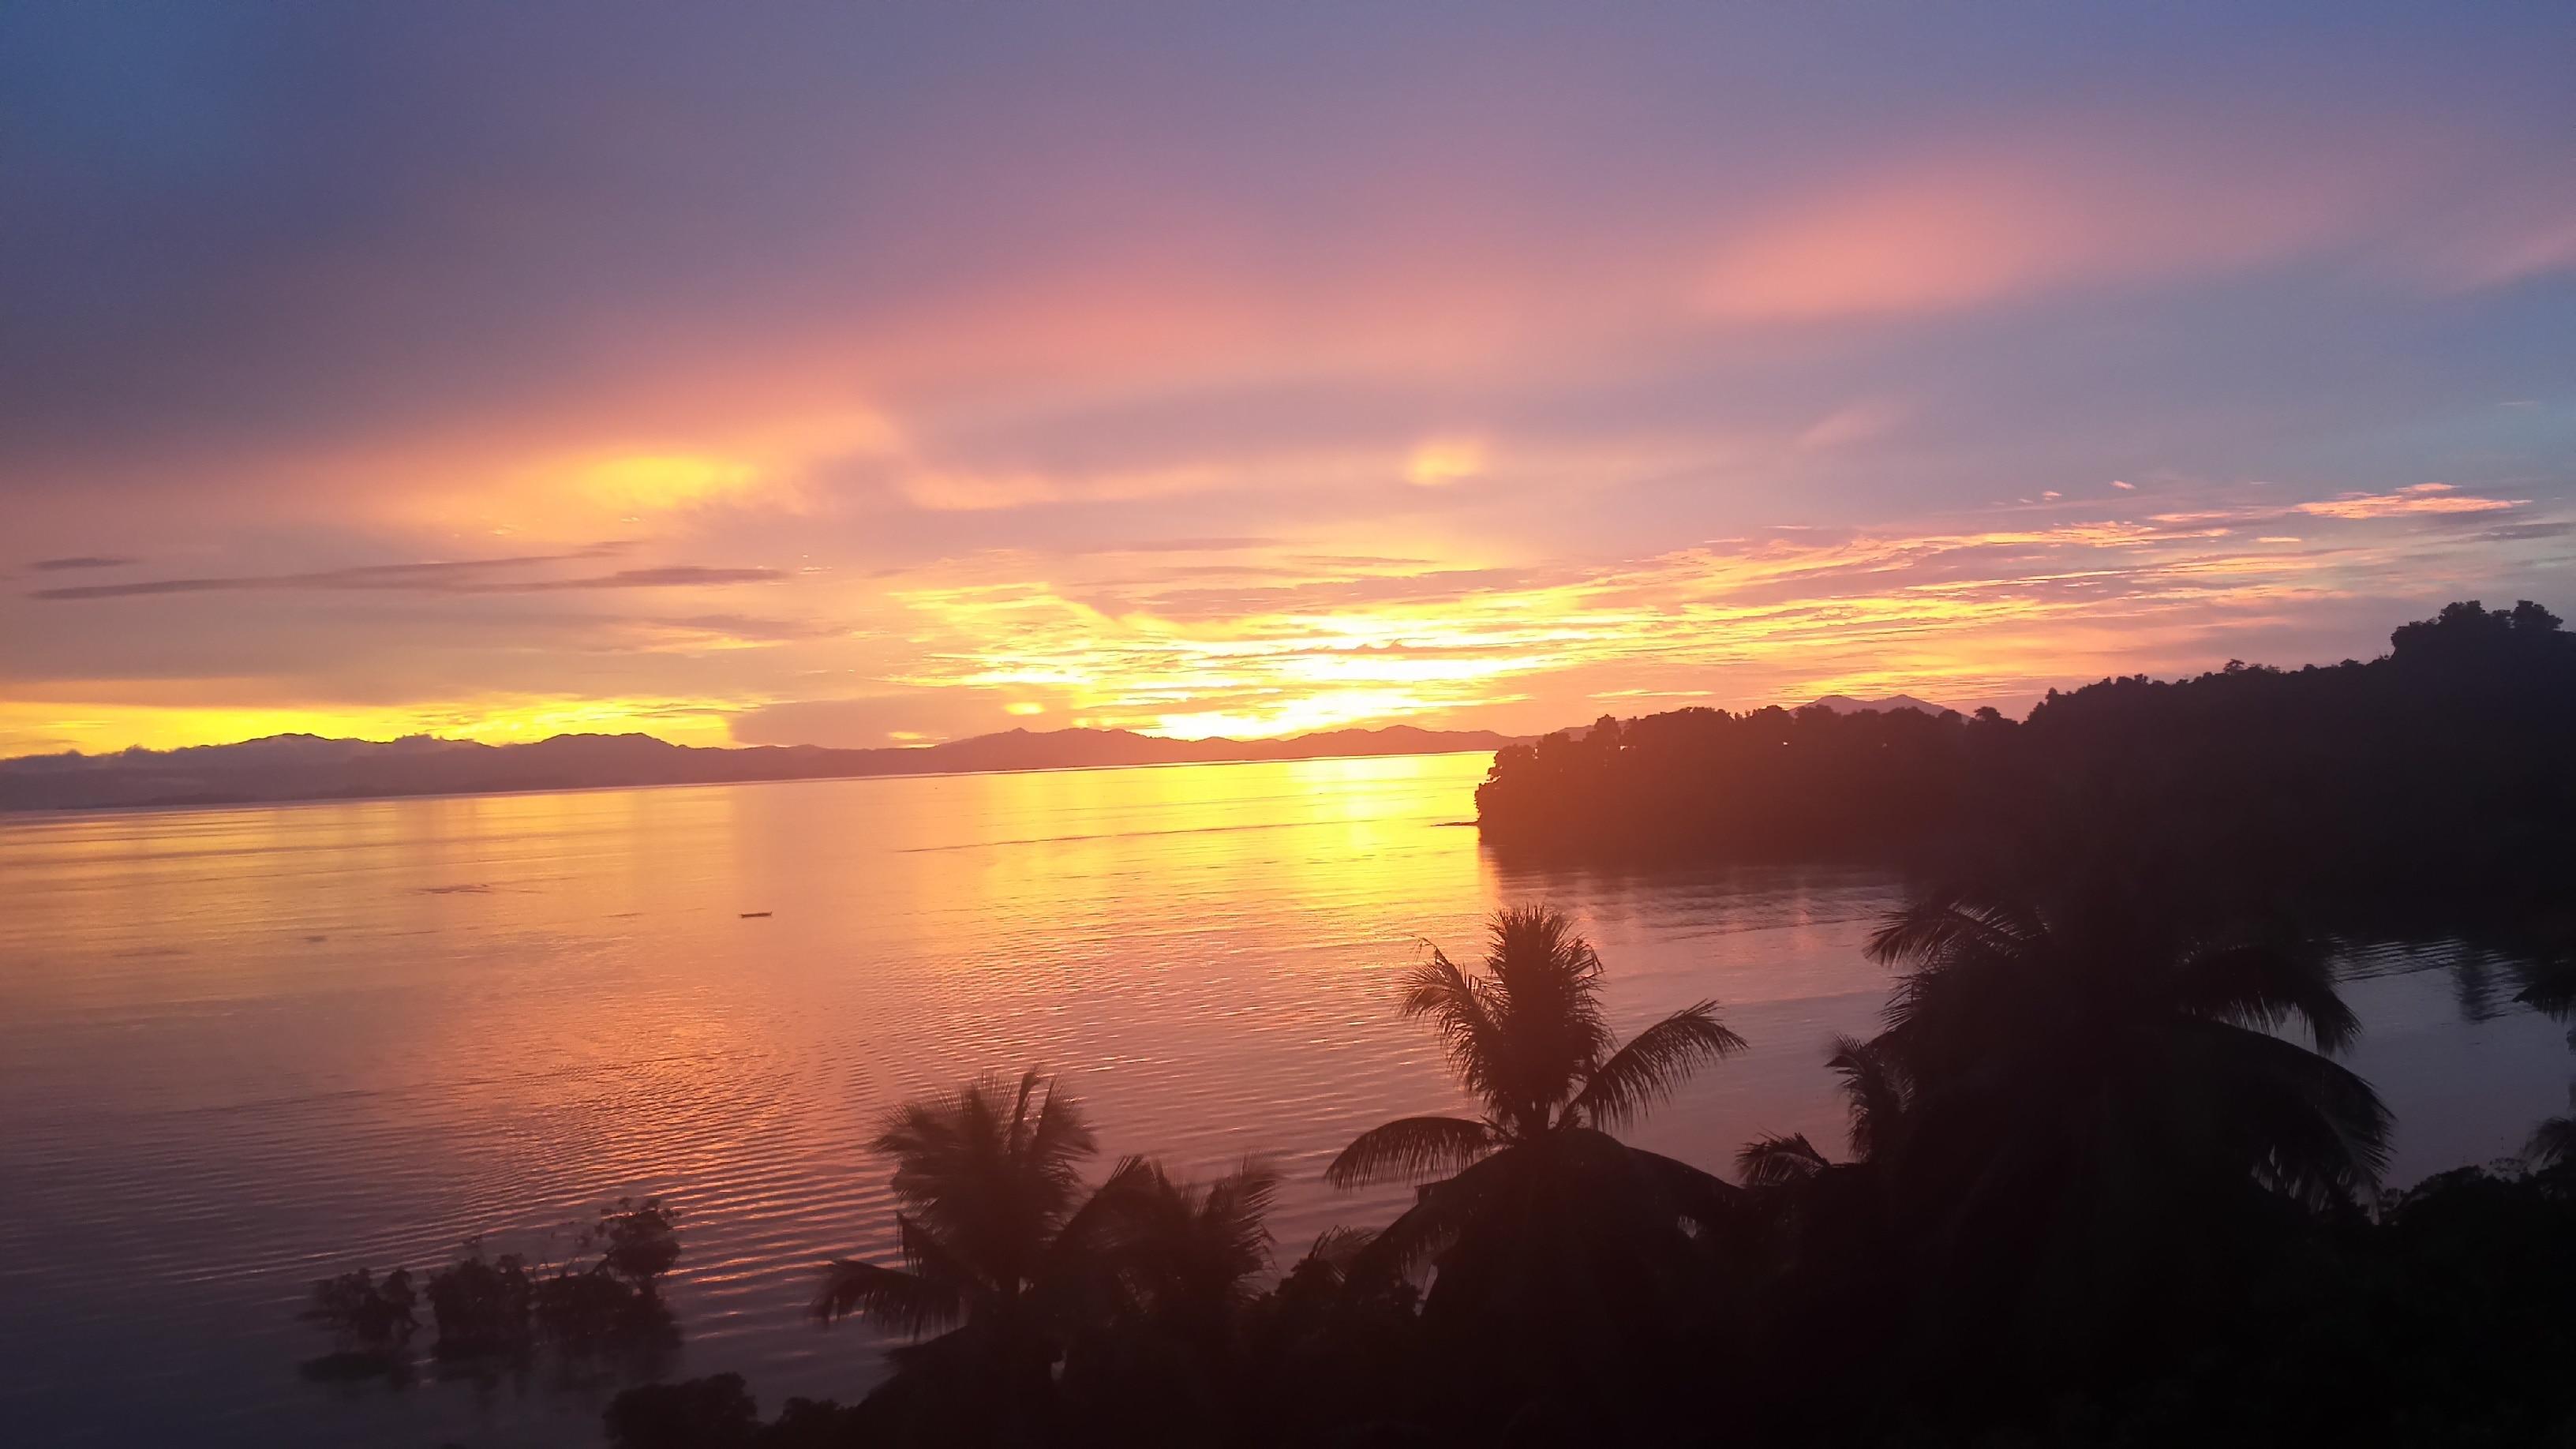 San Vicente, Mimaropa, Philippines